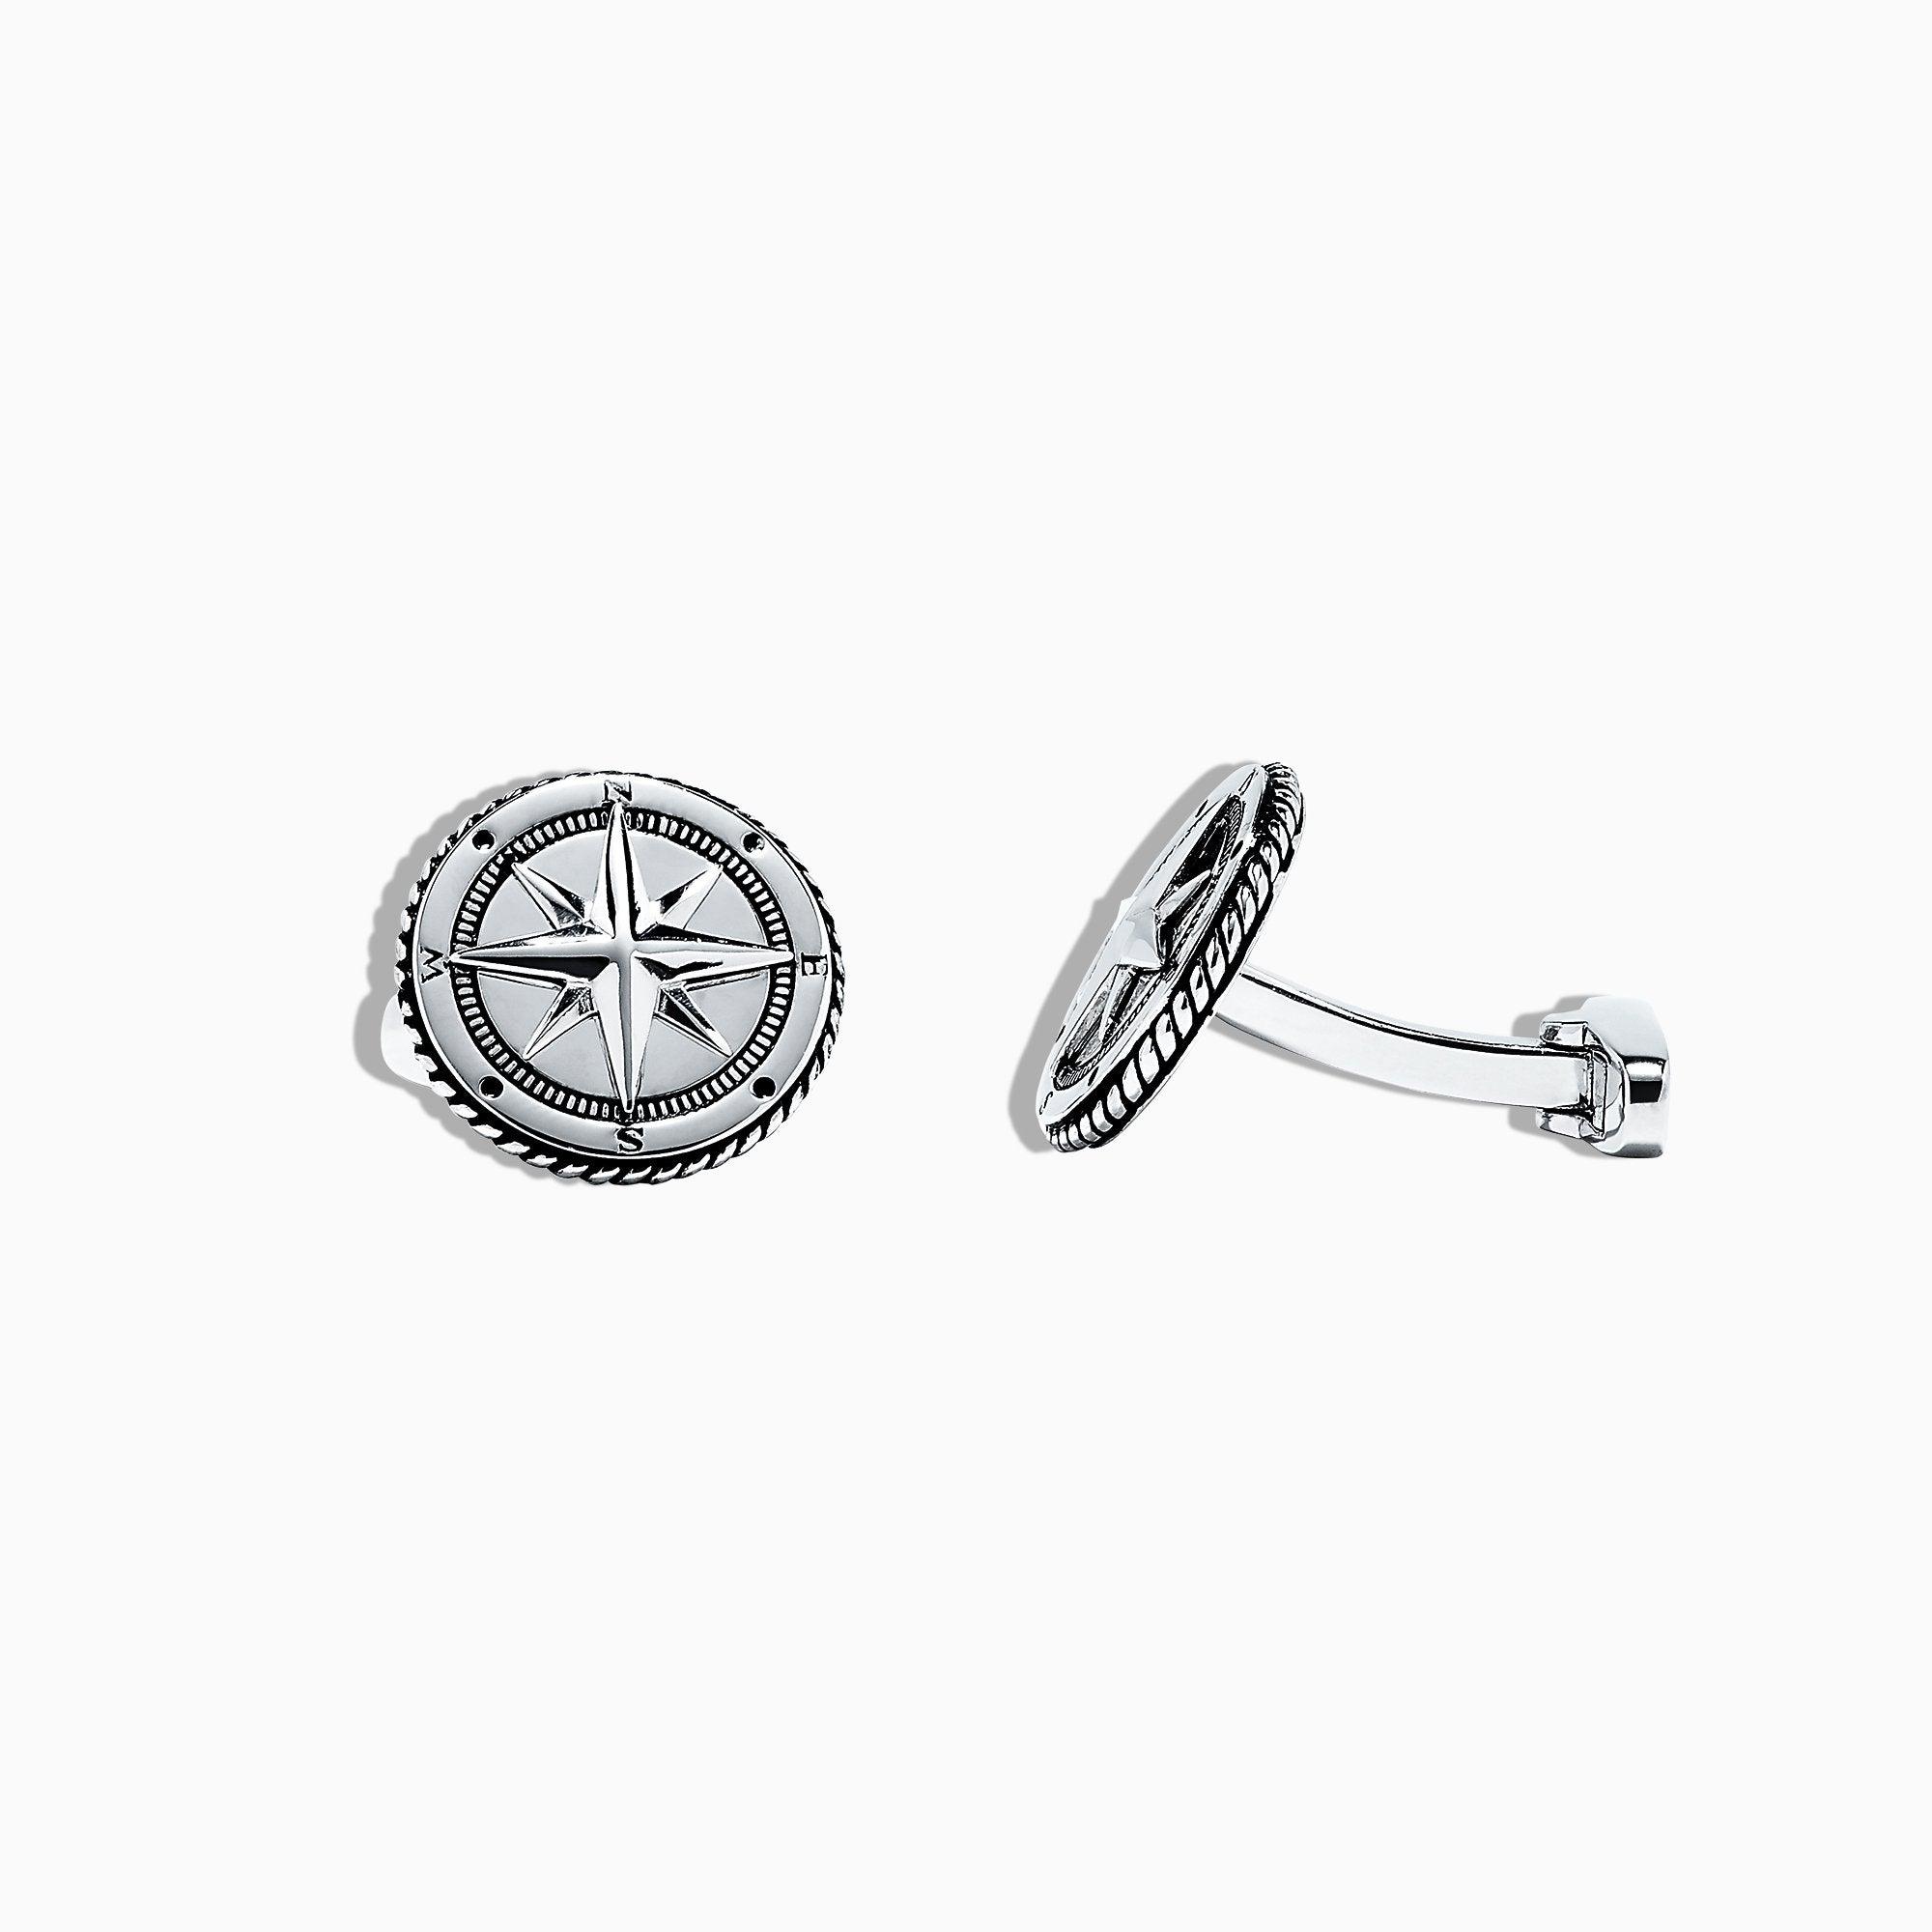 Effy 925 Sterling Silver Compass Cufflinks